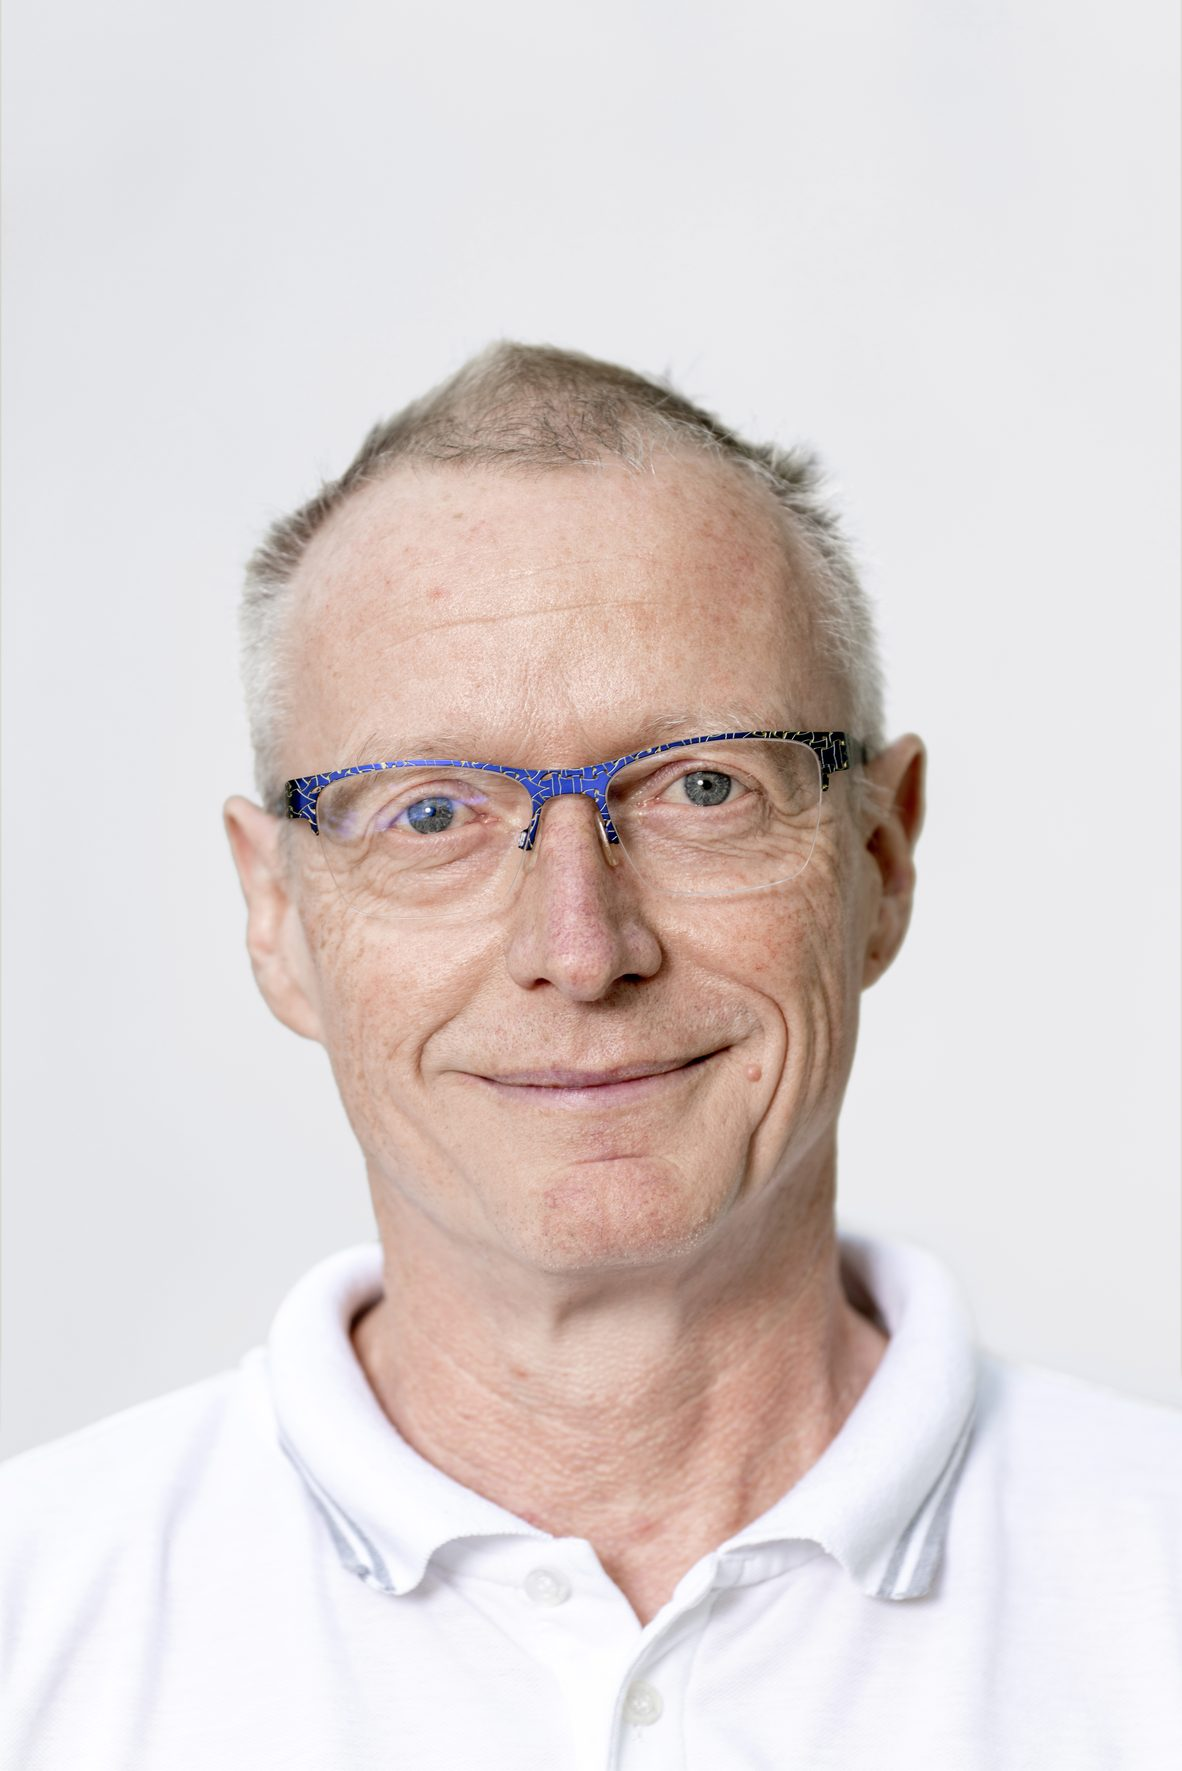 proktologiepraxis-frankfurt-Team-Frankfurt-Höchst_1001501.jpg